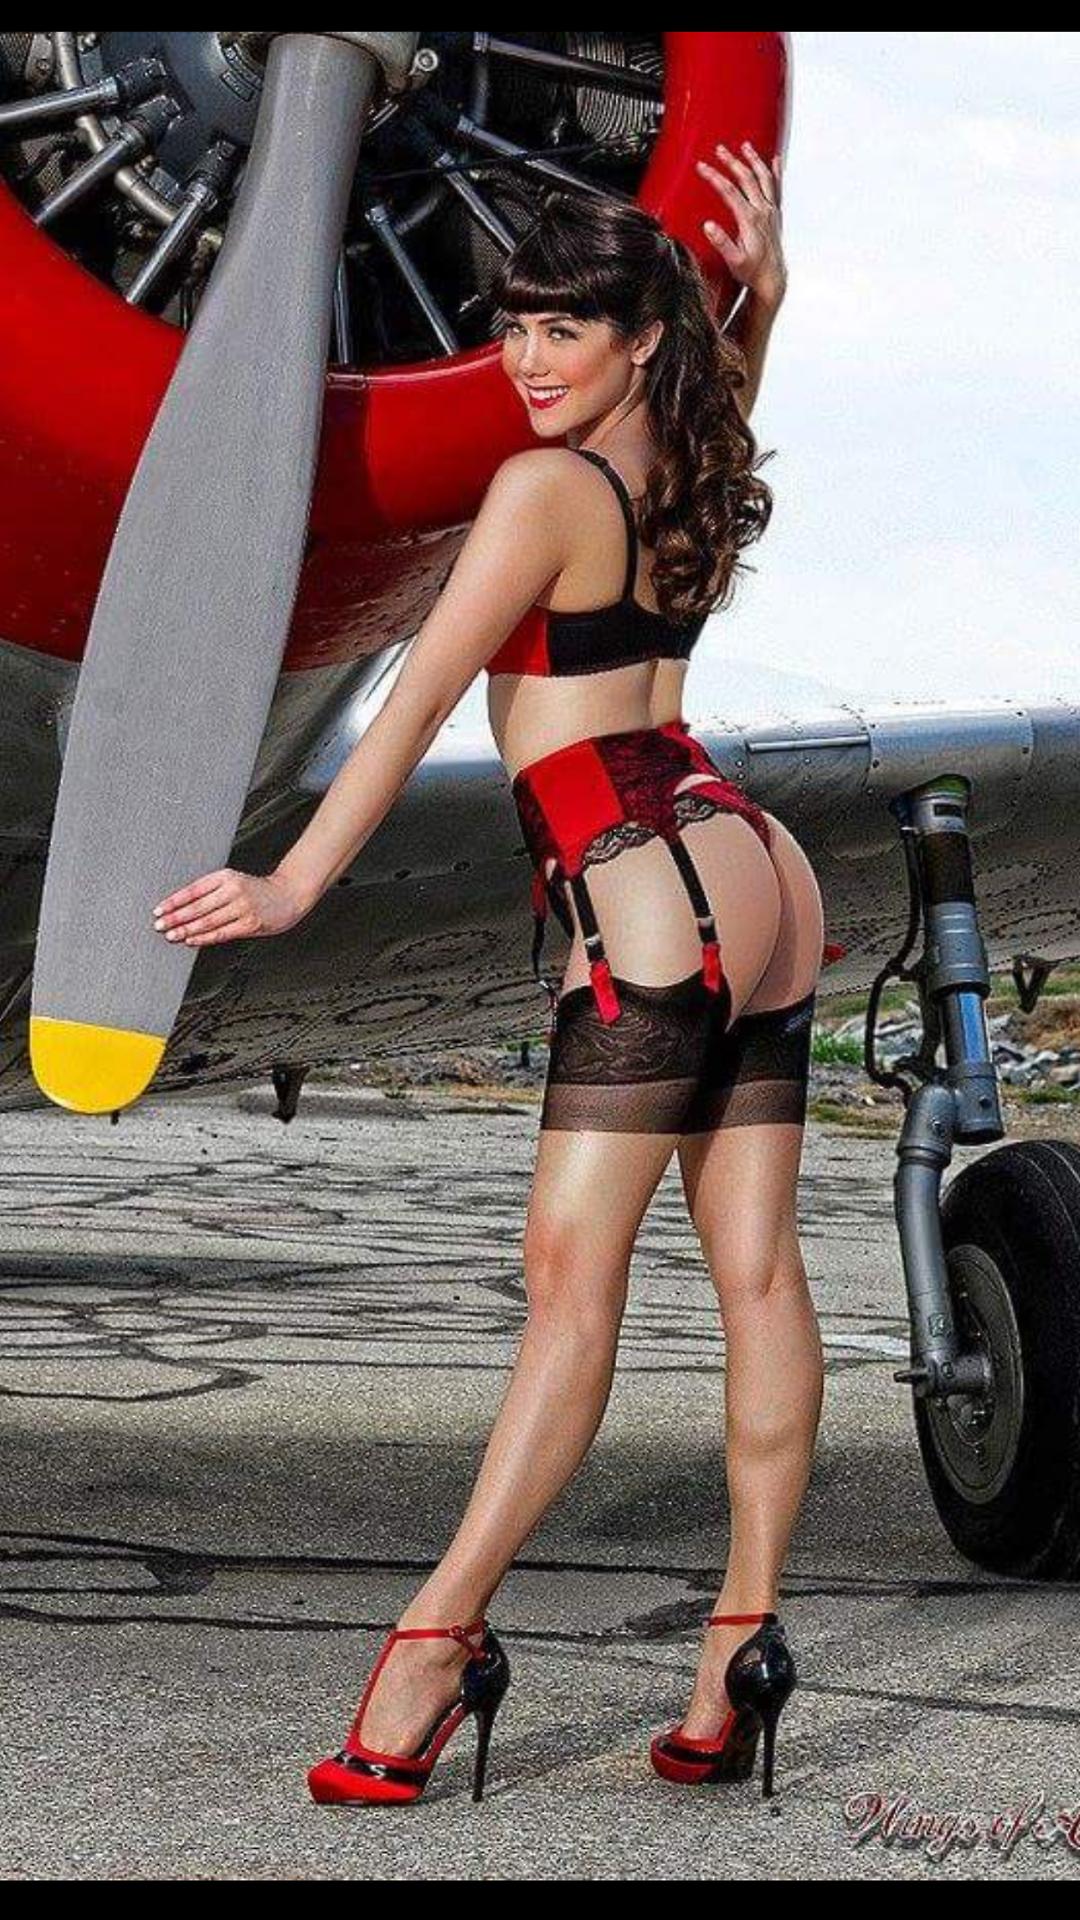 Angie of full throttle saloon